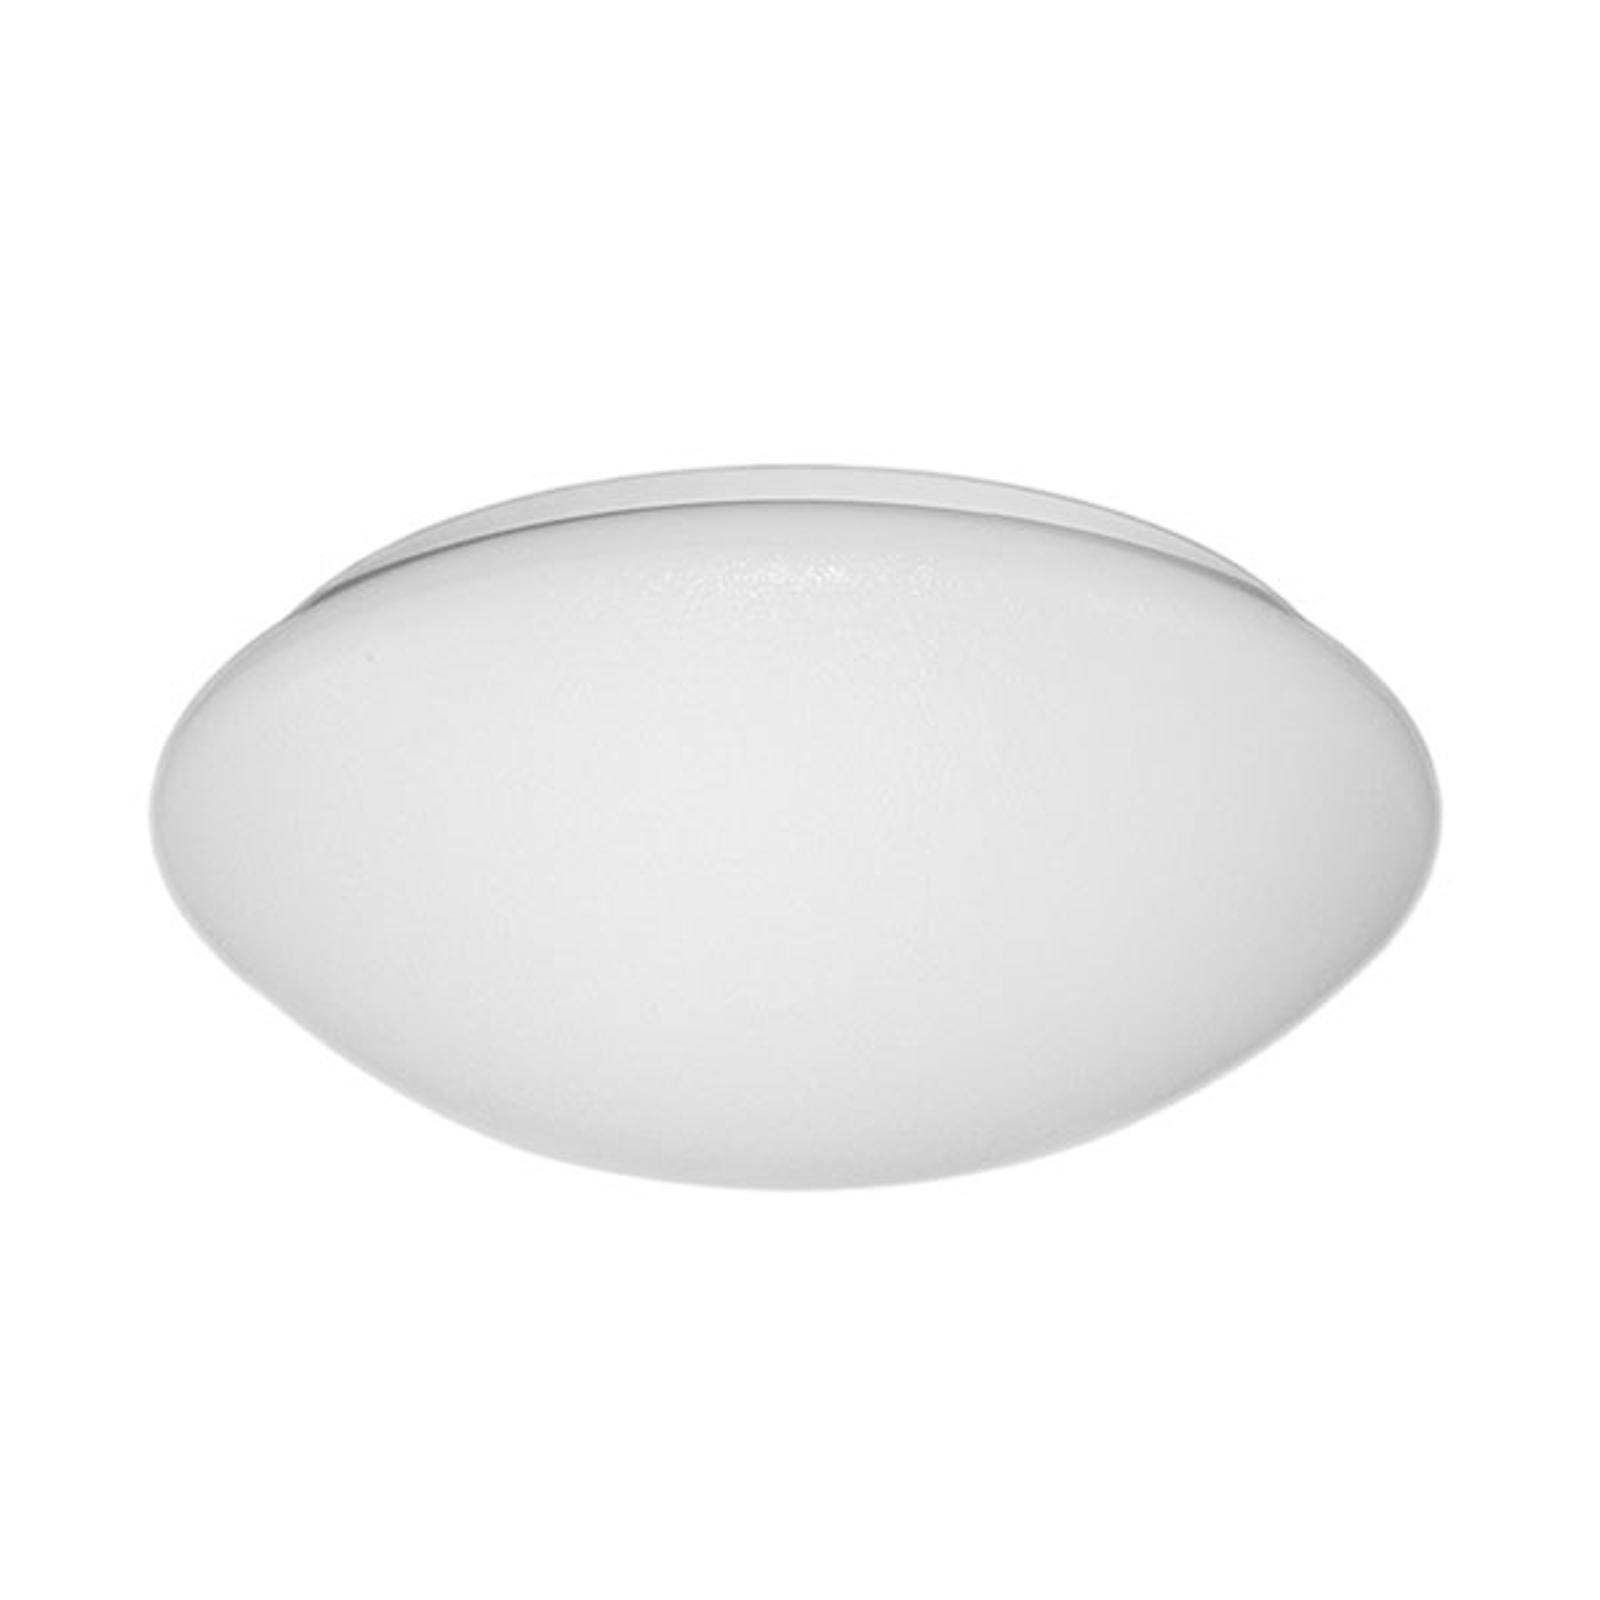 LED-taklampe, bruddsikker, 27 W, 4000K